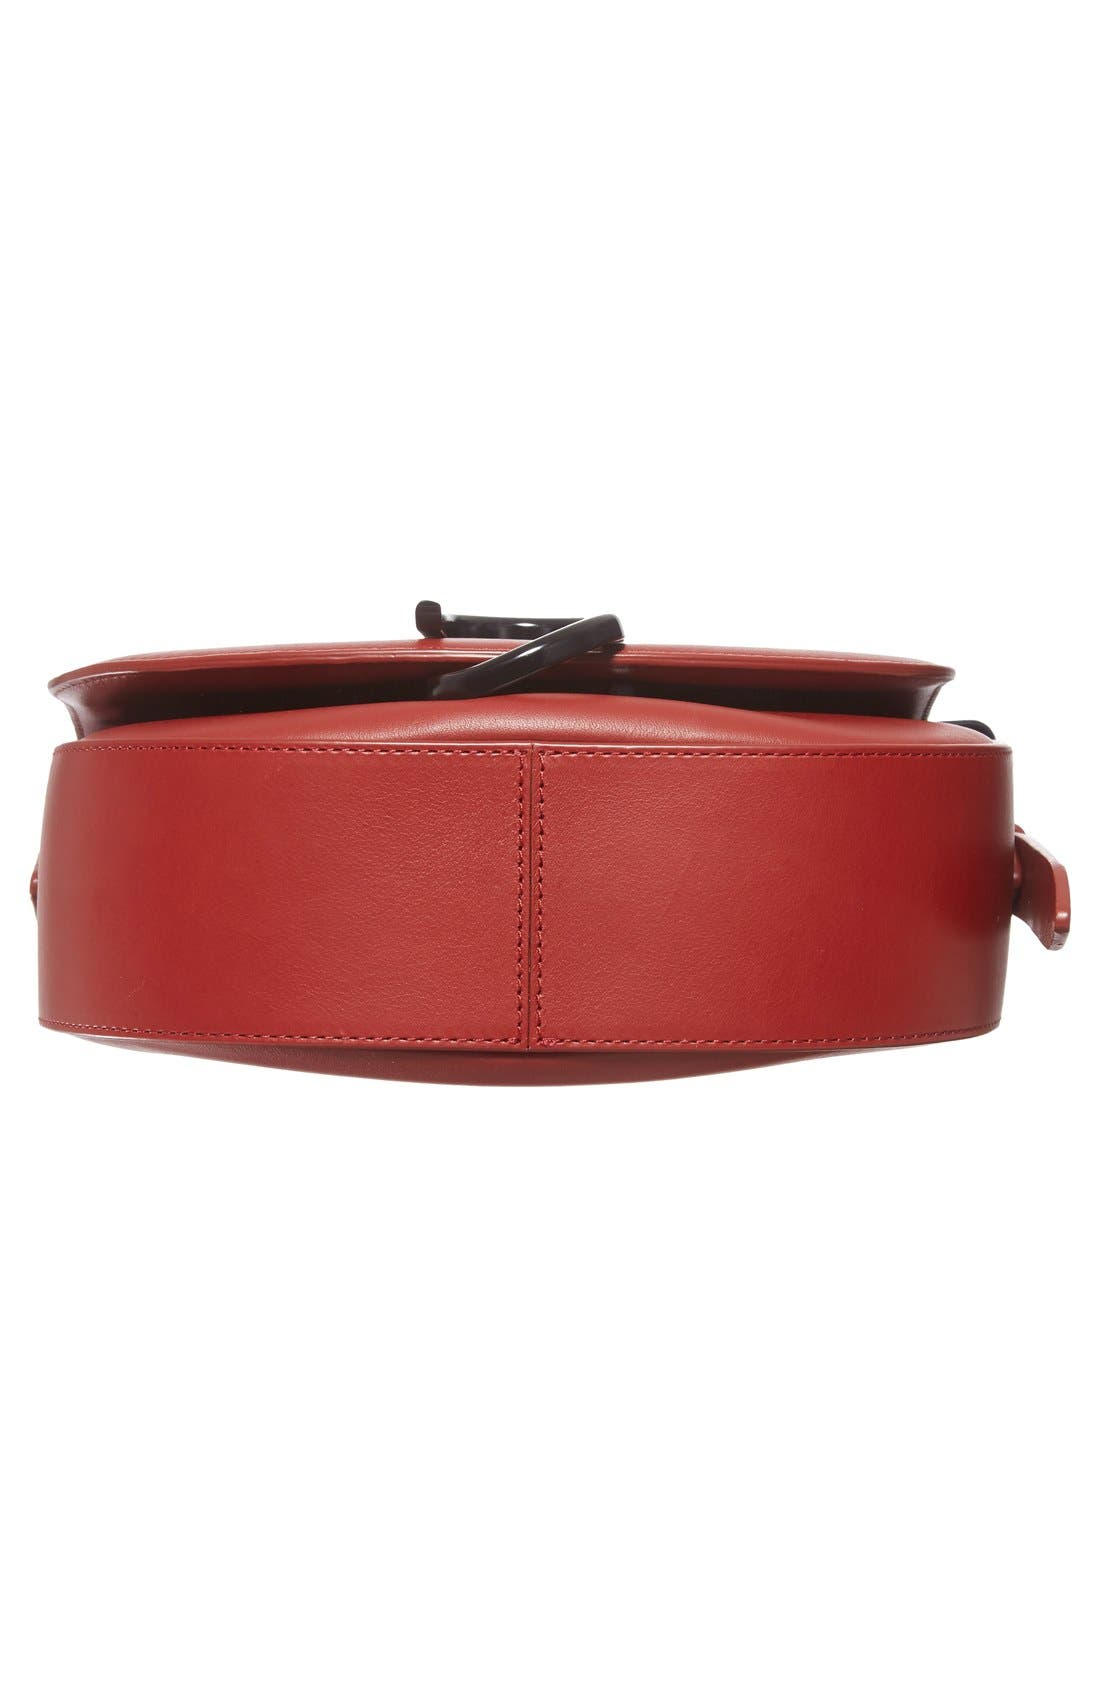 Alix Leather Saddle Bag,                             Alternate thumbnail 18, color,